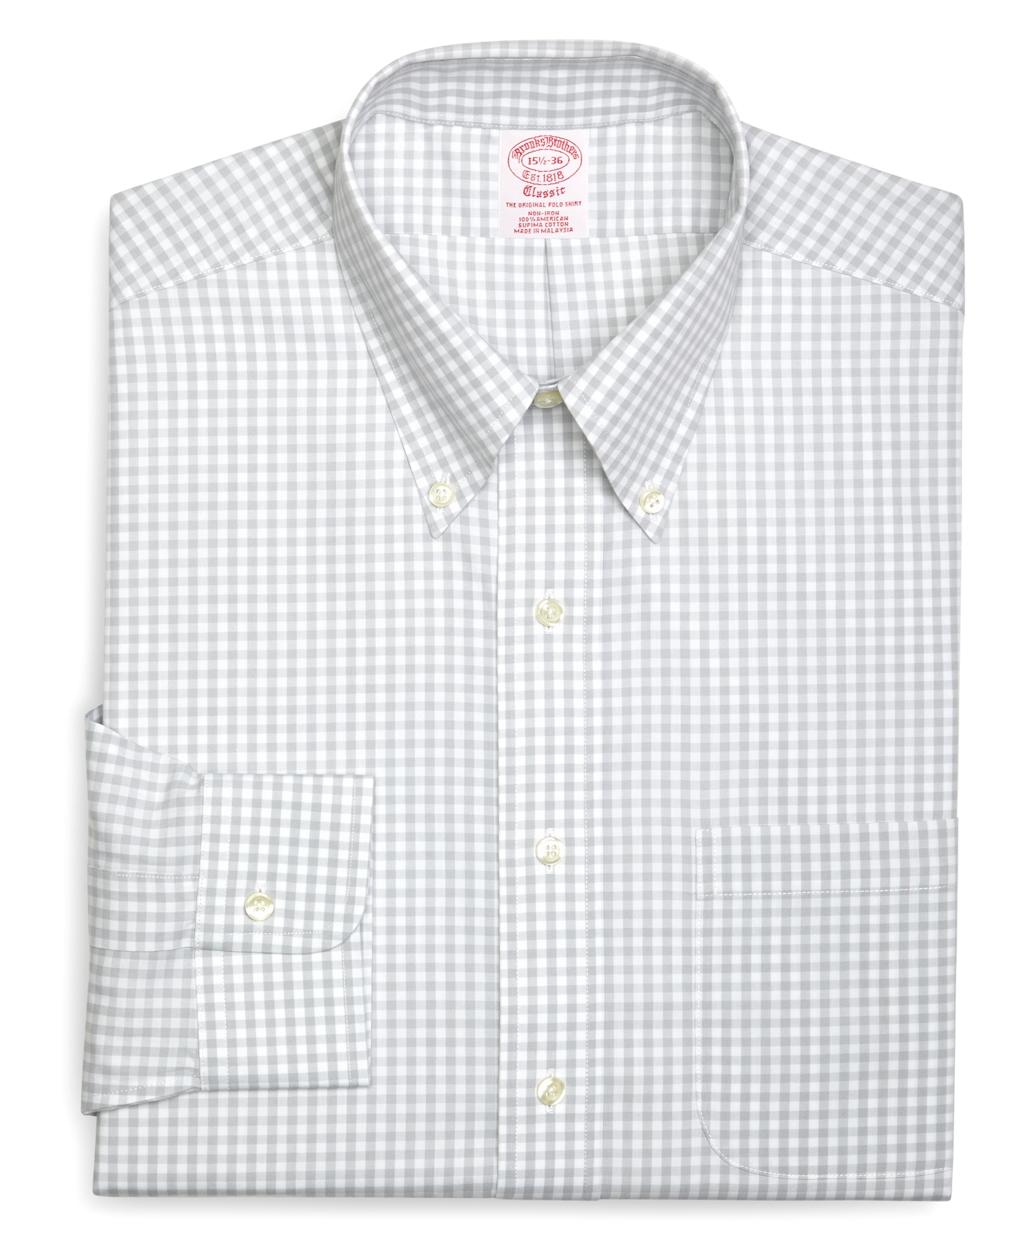 38d33de3c3 Brooks Brothers Extra Slim Fit Sport Shirts - DREAMWORKS